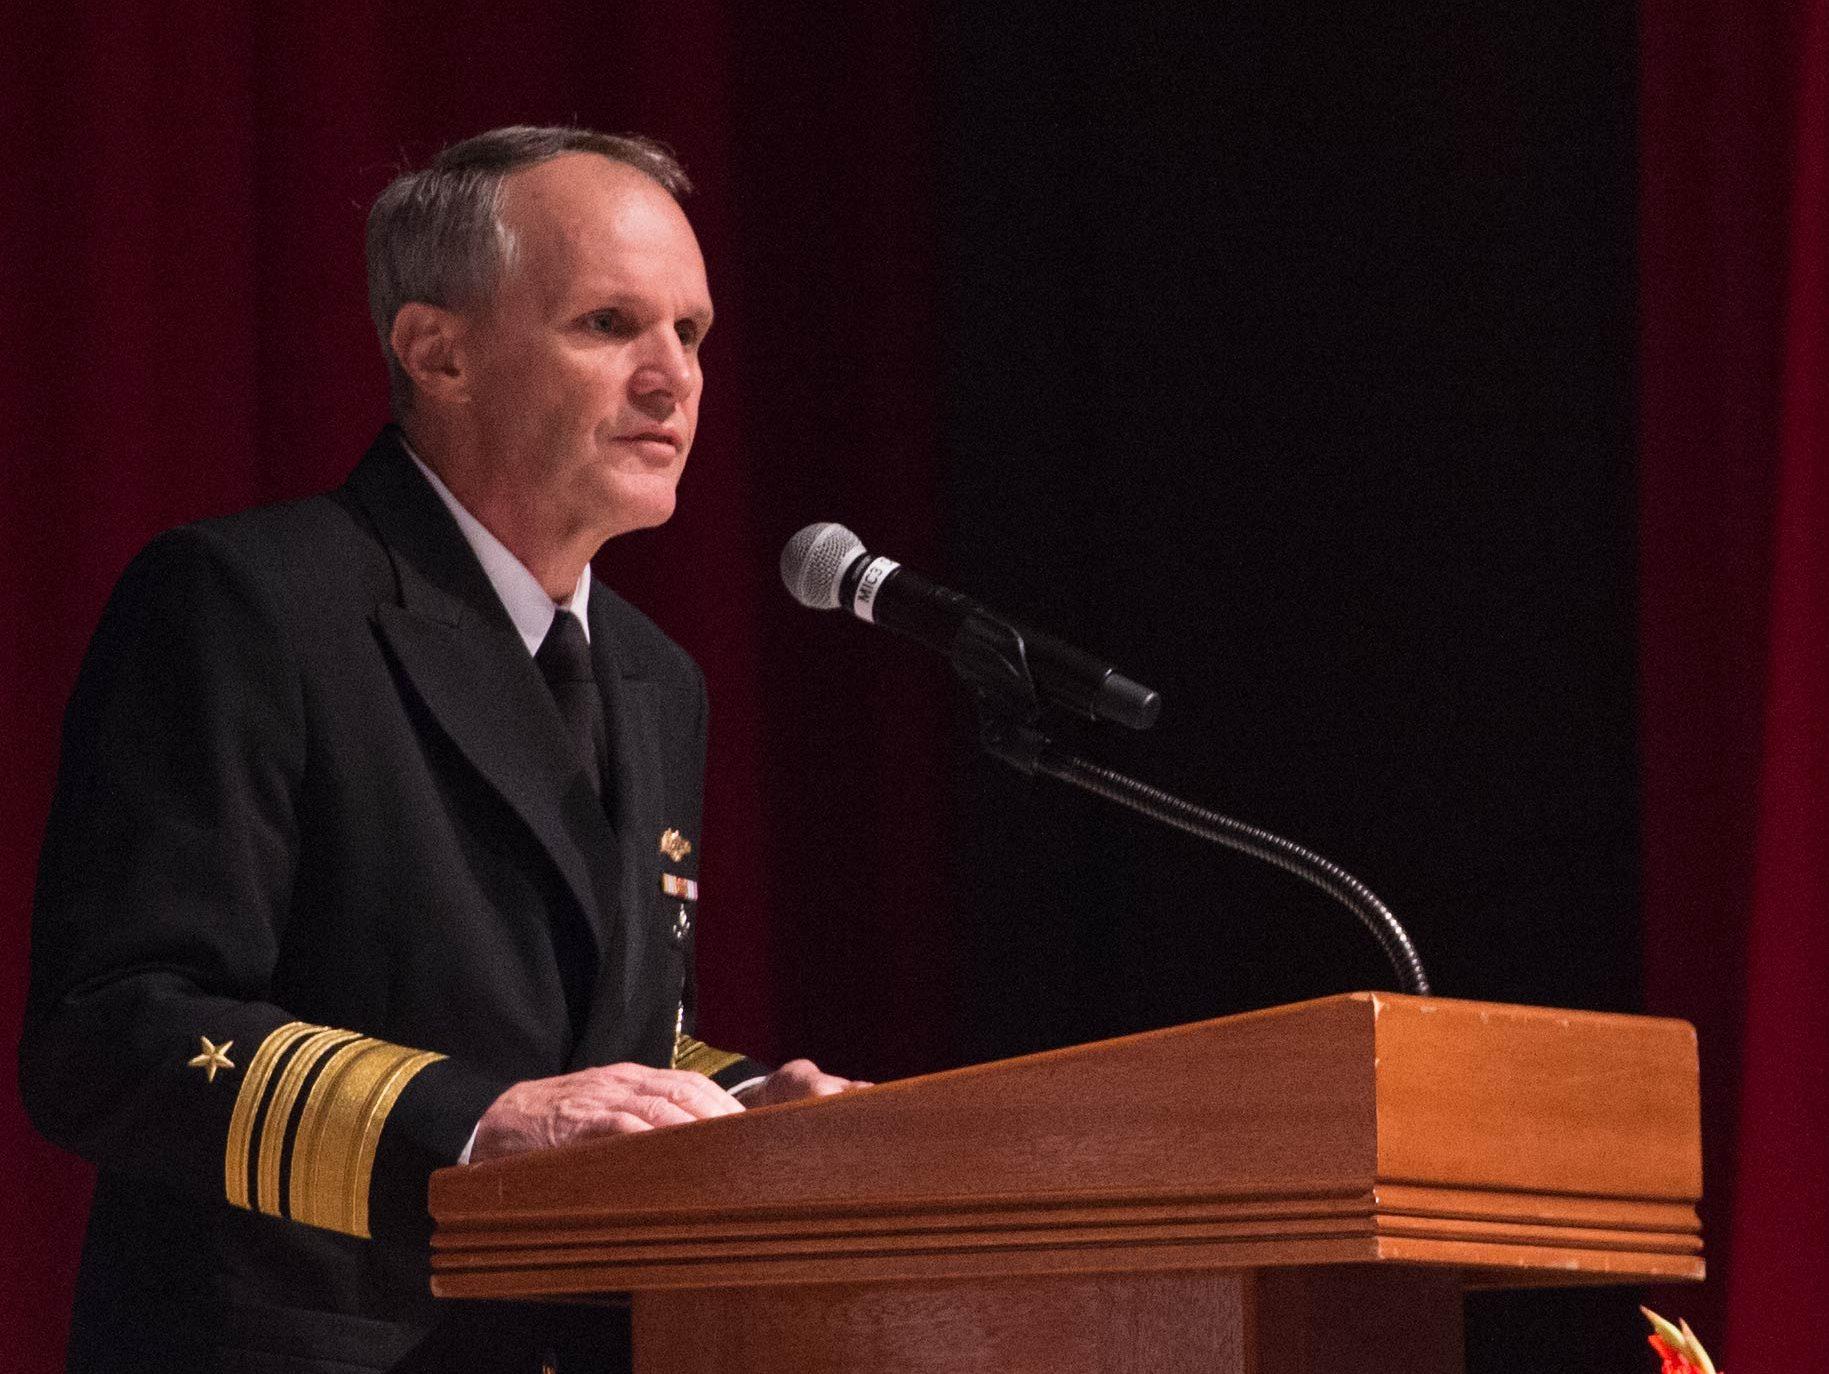 Vice Adm. Phillip G. Sawyer addresses attendees of the USS John S. McCain Memorial Service at Fleet Activities Yokosuka, Japan on Oct. 4, 2017.